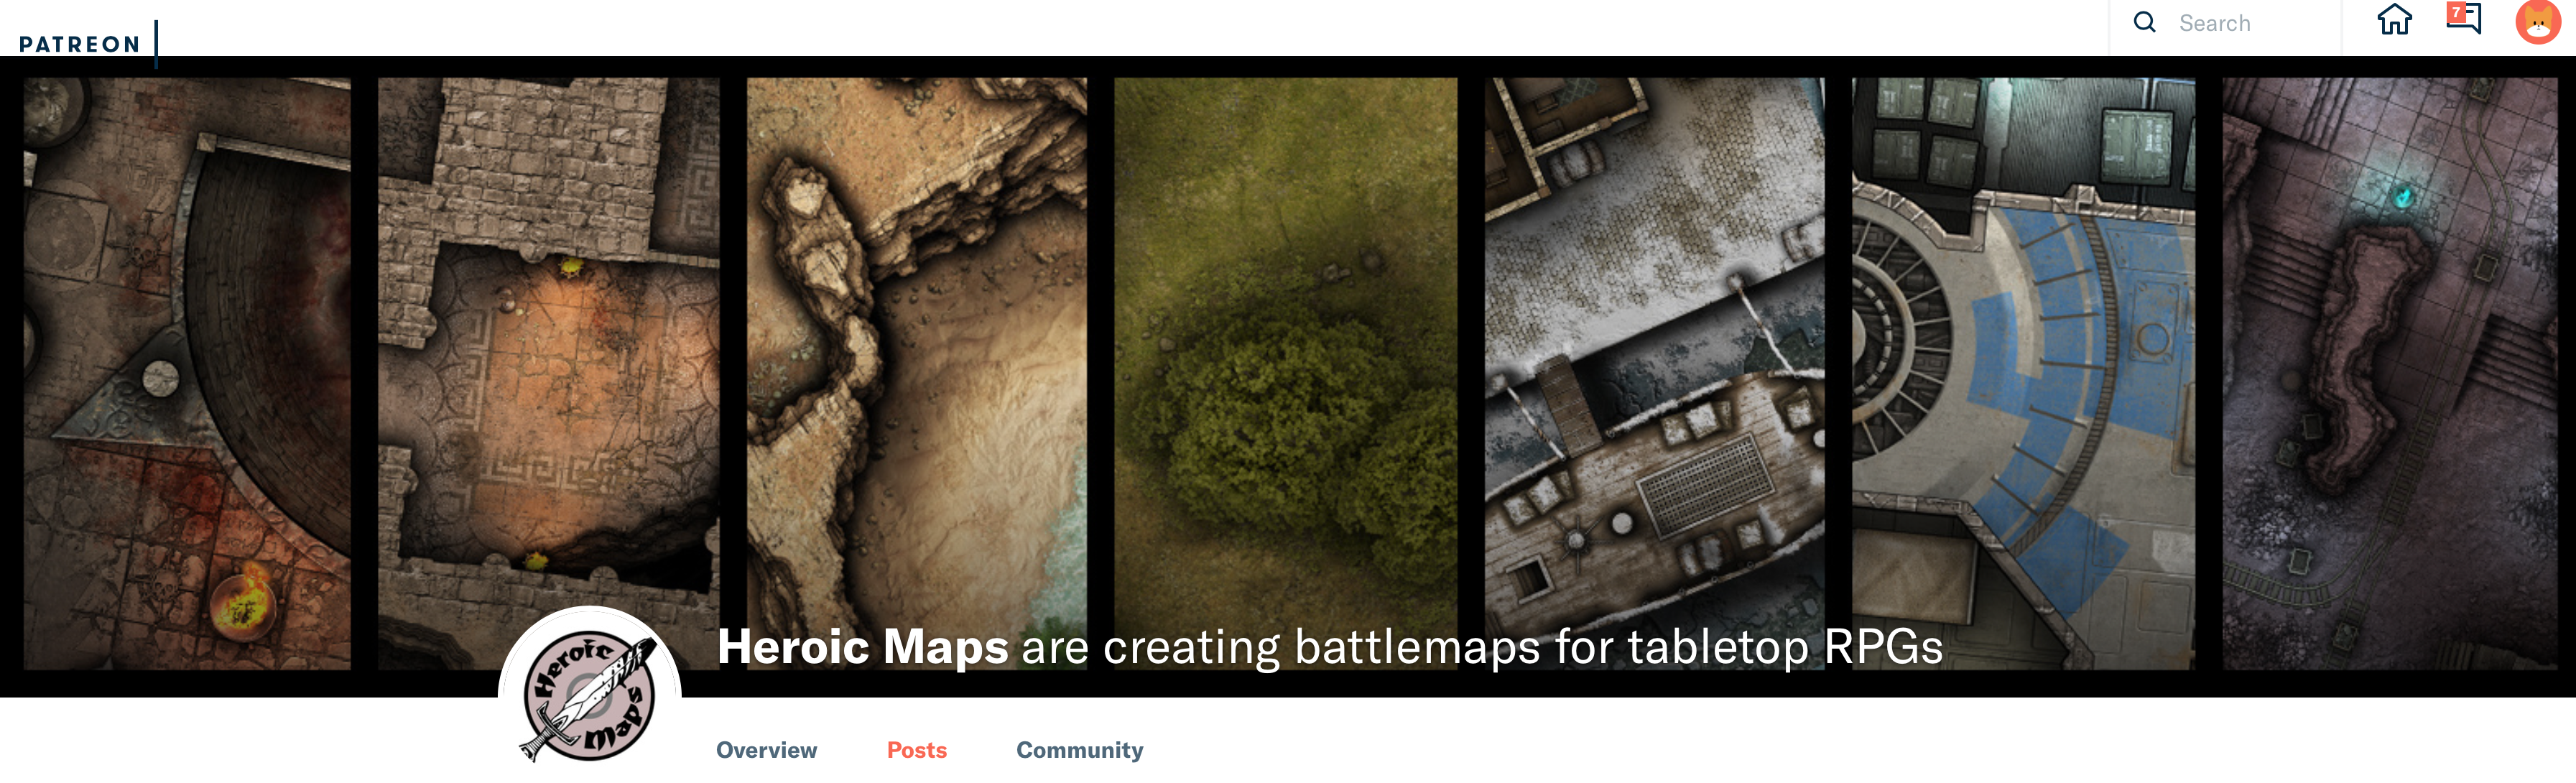 heroicmaps